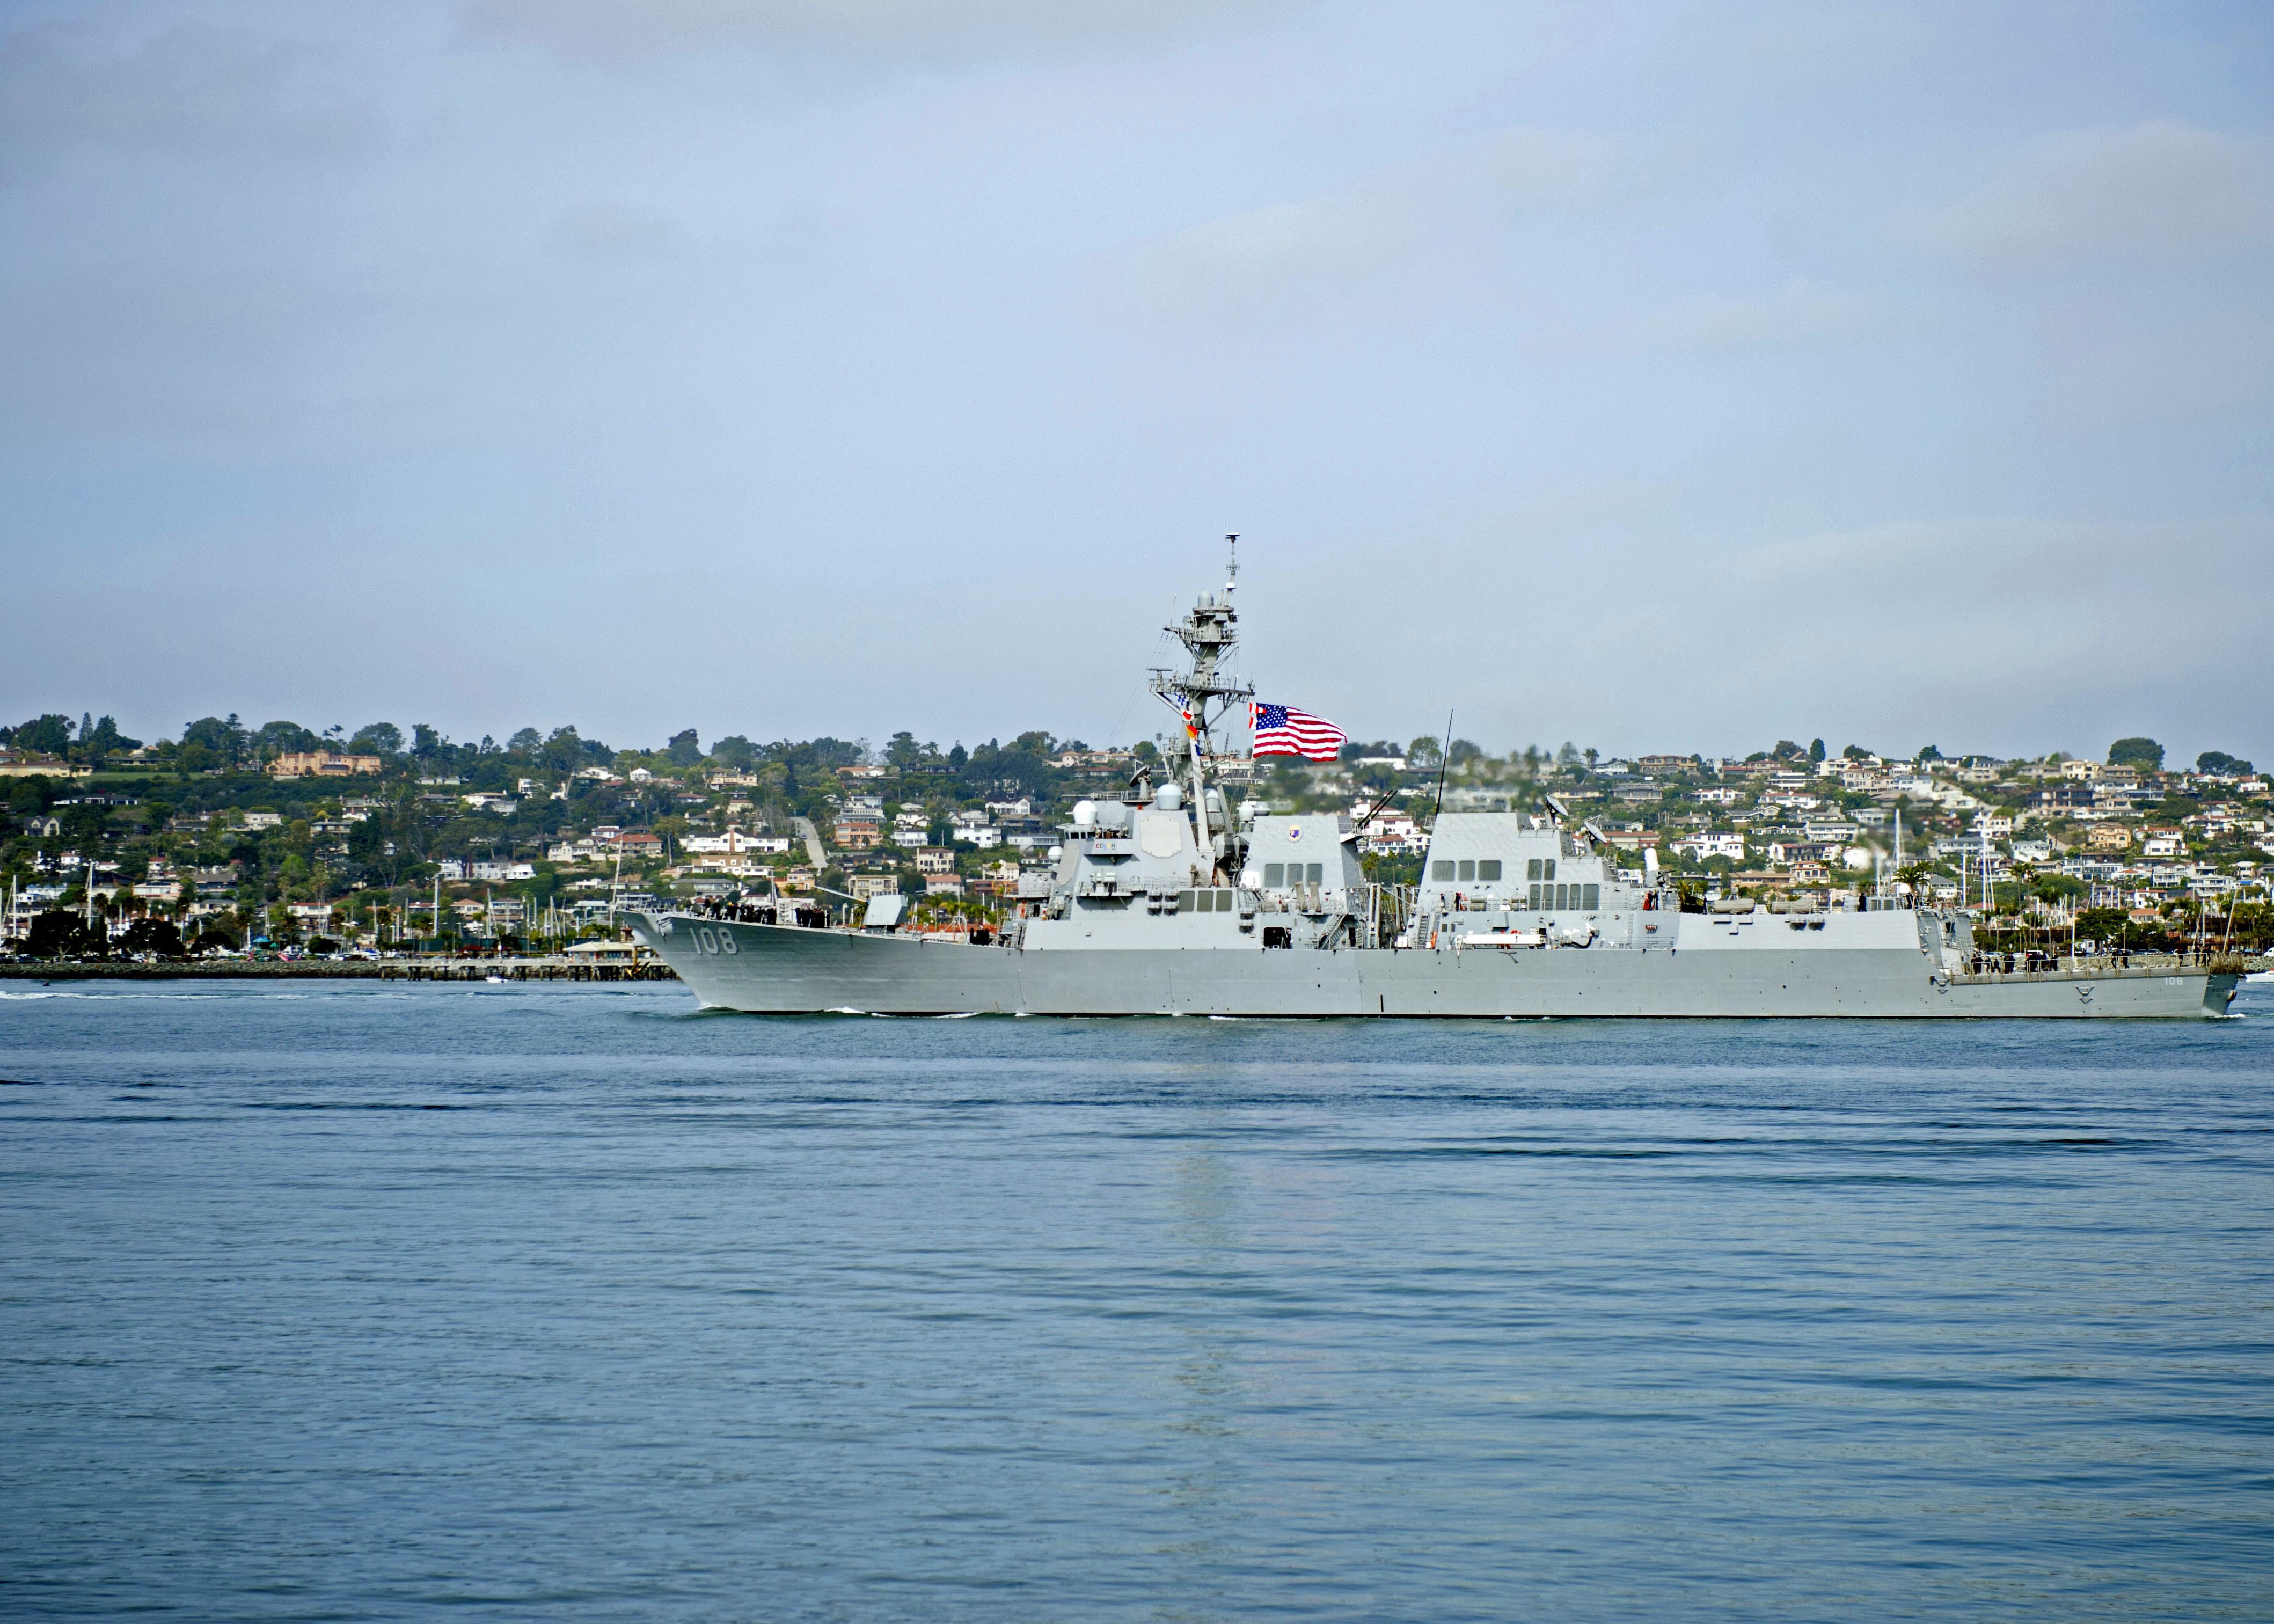 USS WAYNE E. MEYER DDG-108 Auslaufen San Diego am 20.03.2014 Bild: U.S. Navy